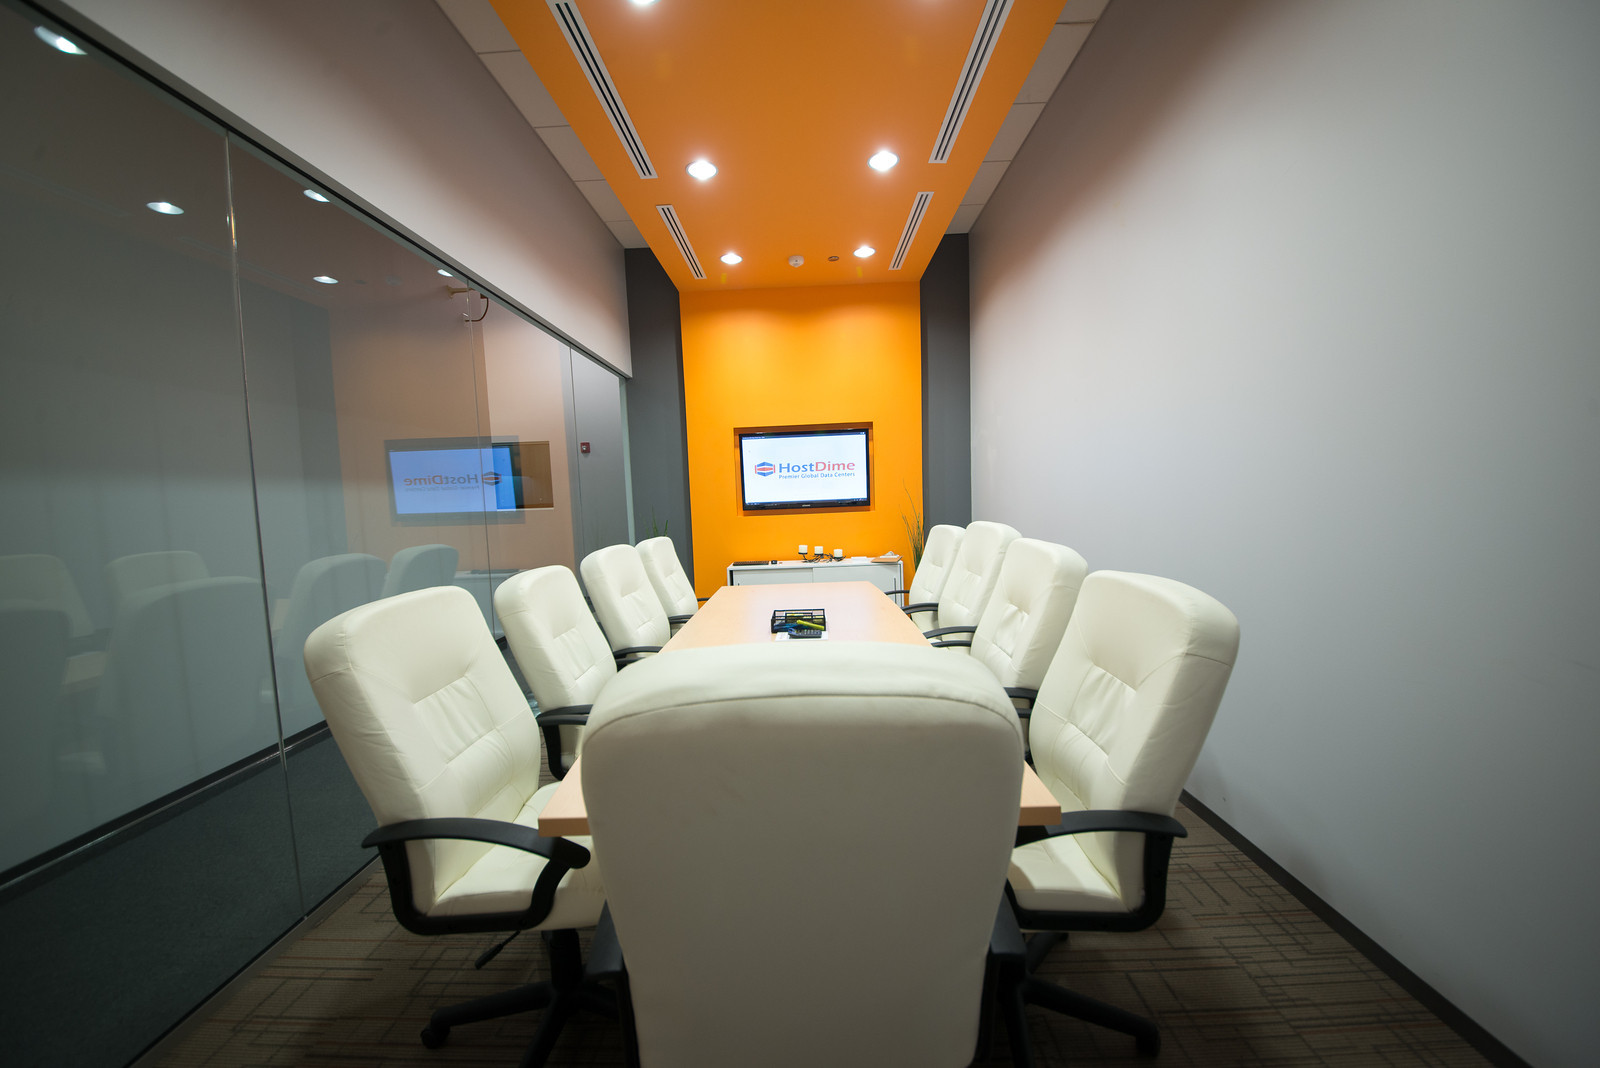 hostdime conference room